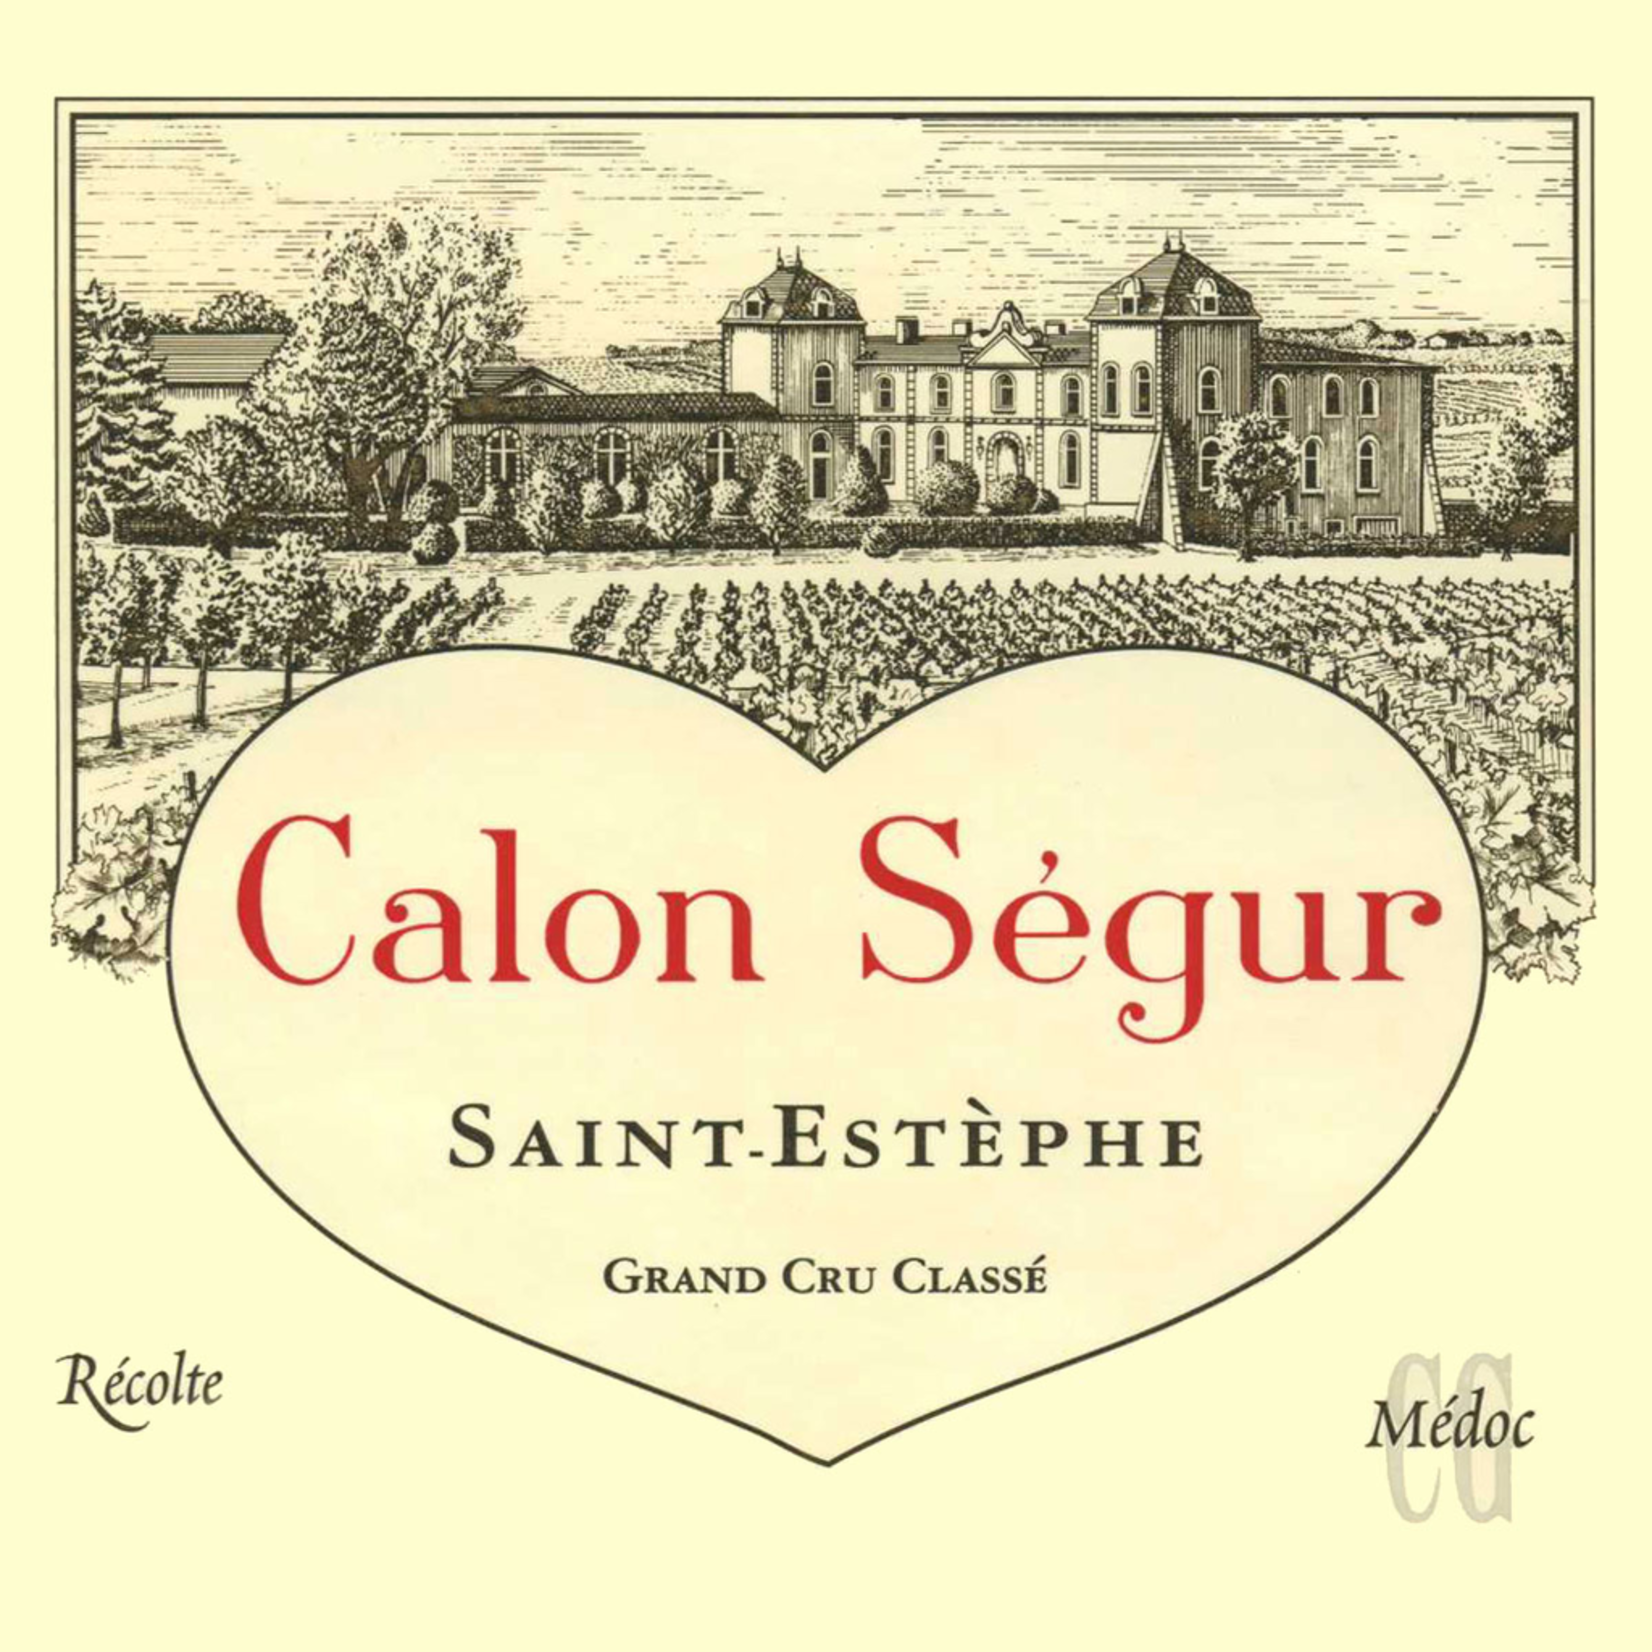 Wine Chateau Calon Segur 2010